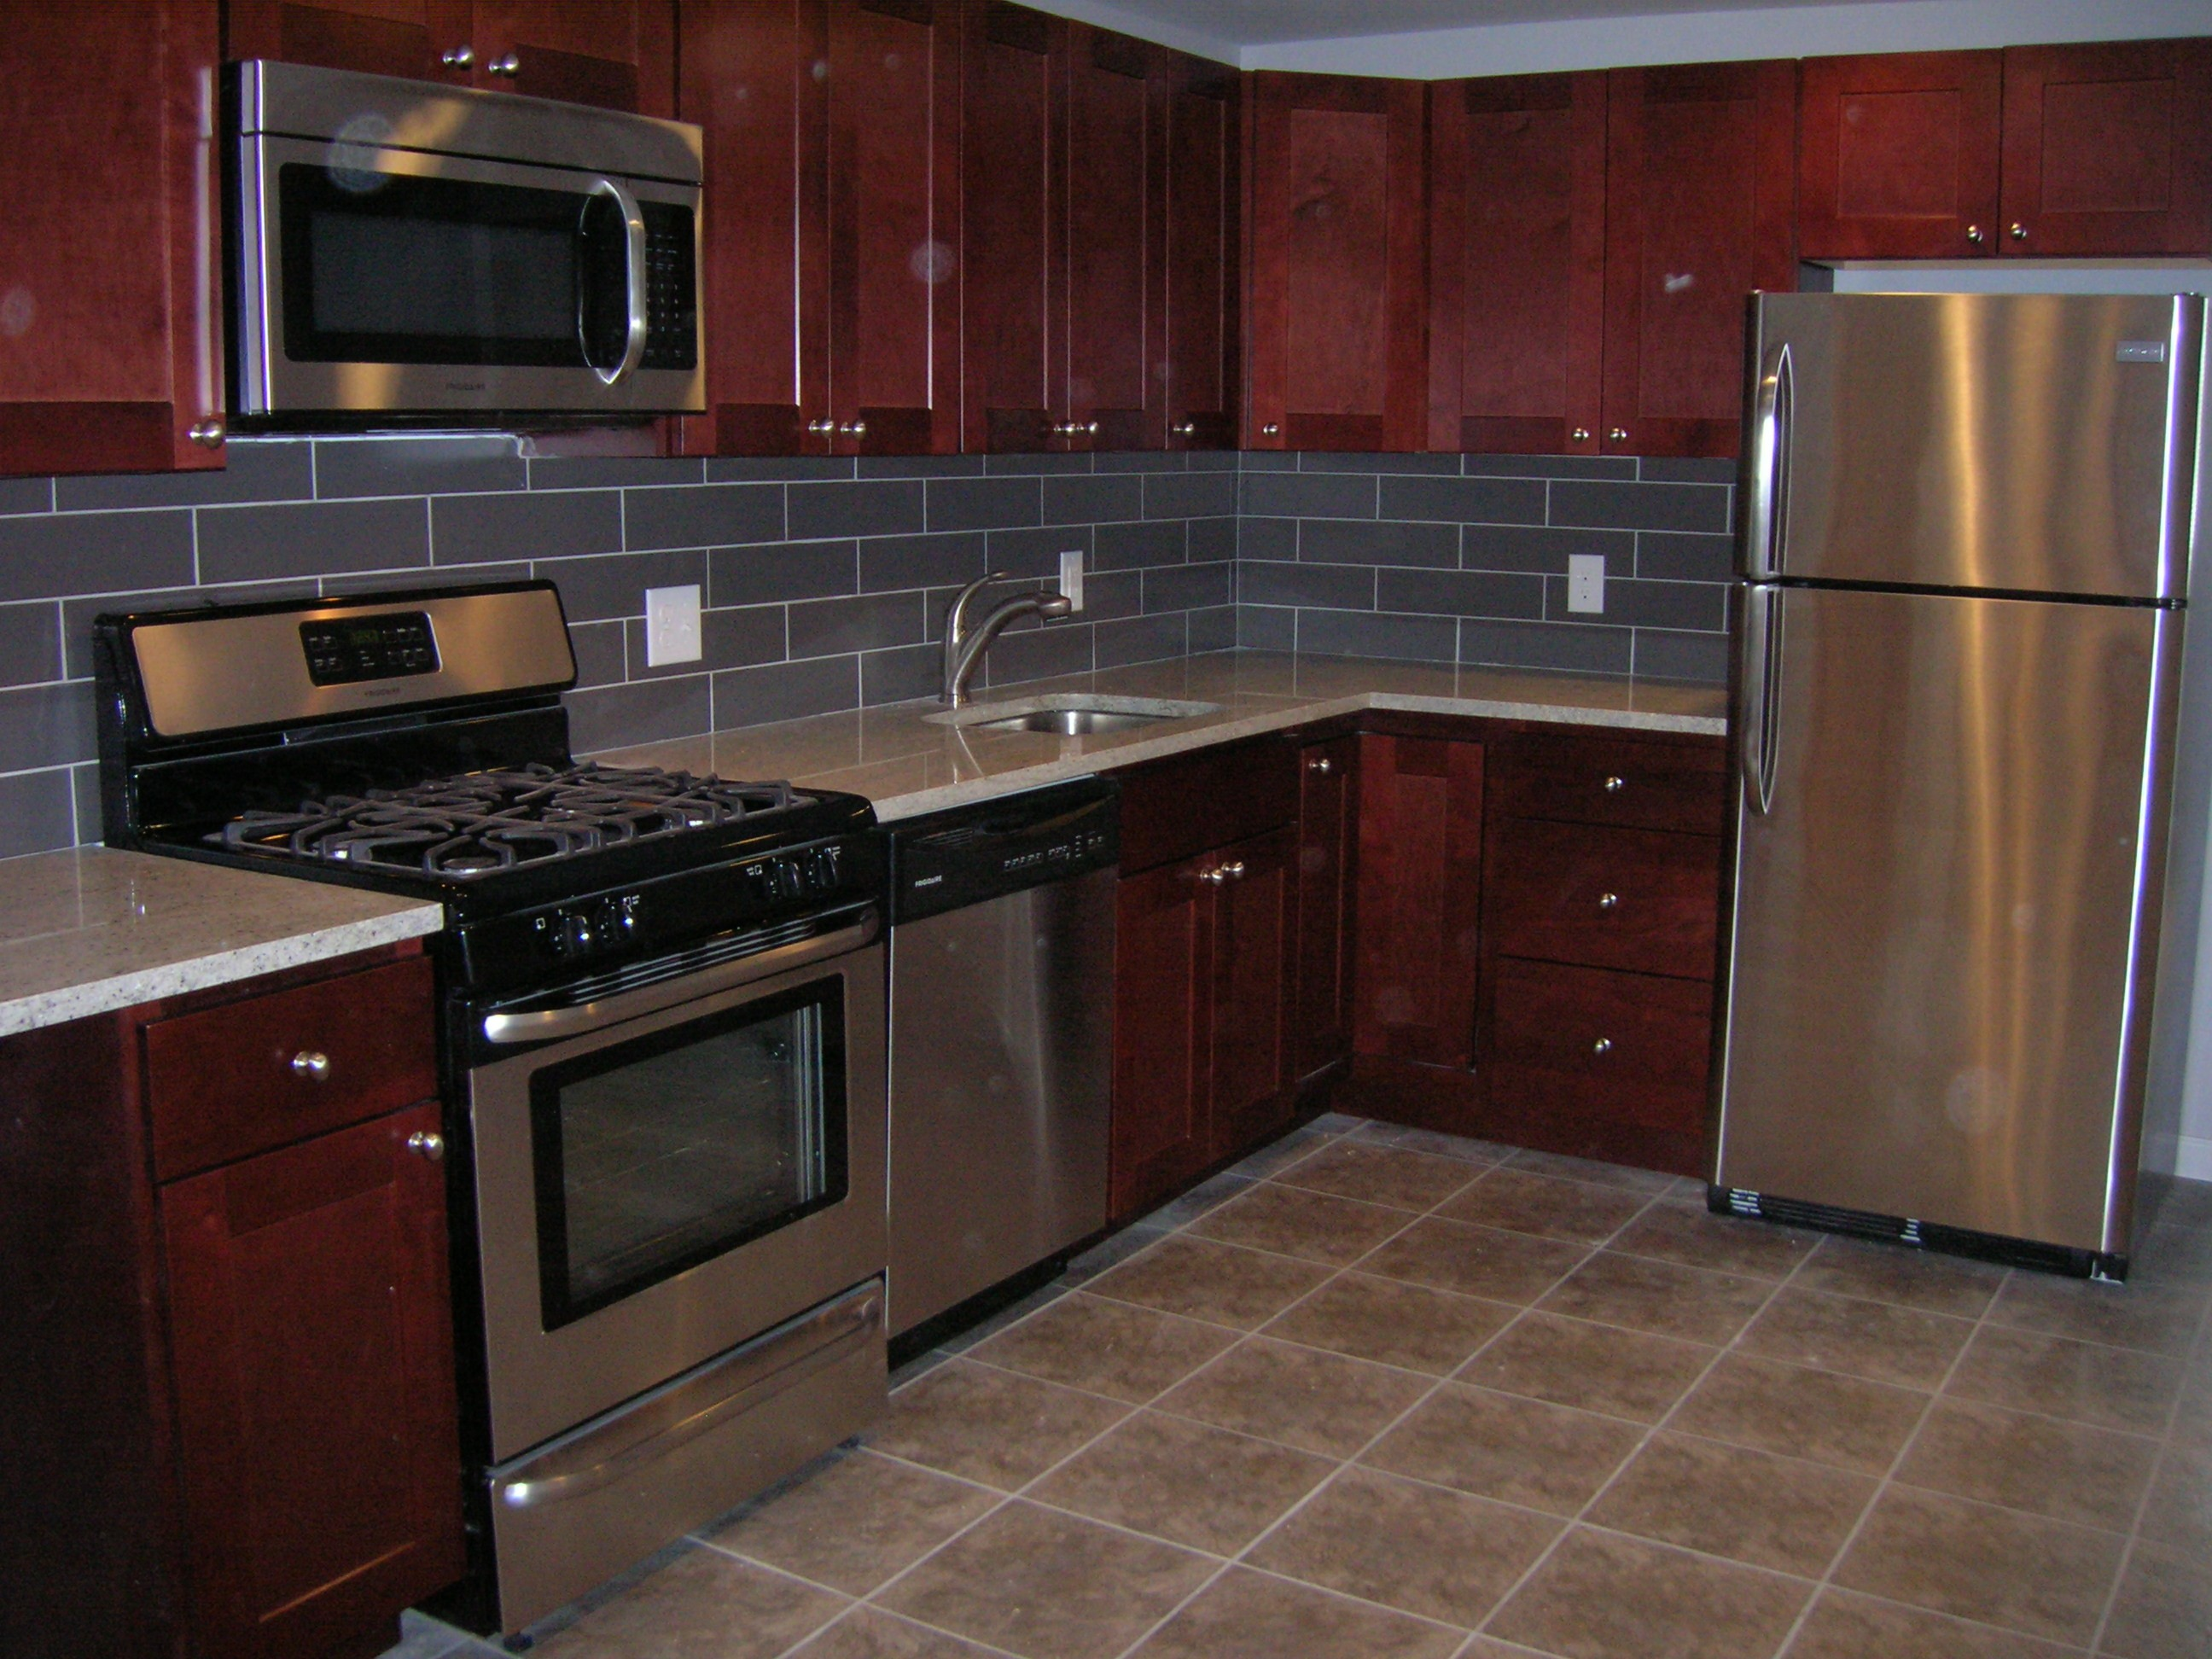 1805 East Passyunk Avenue #3, Philadelphia, PA 19148 1 Bedroom Apartment  For Rent For $1,350/month   Zumper